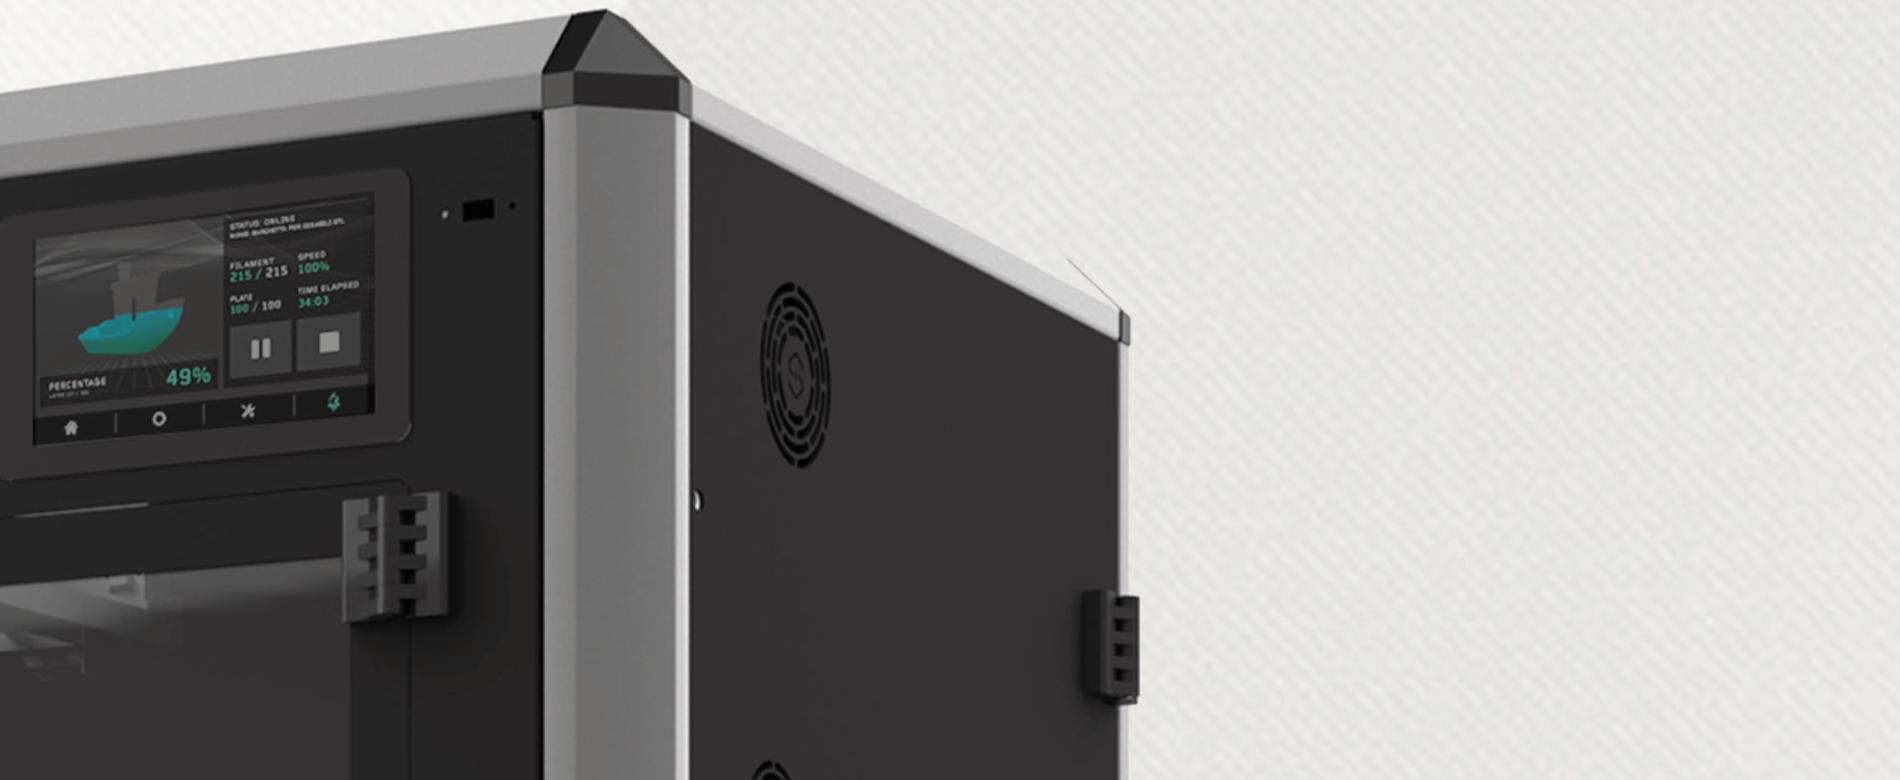 Stampanti 3D Sharebot Monza stampanti 3D professionali 3d store 3d shop